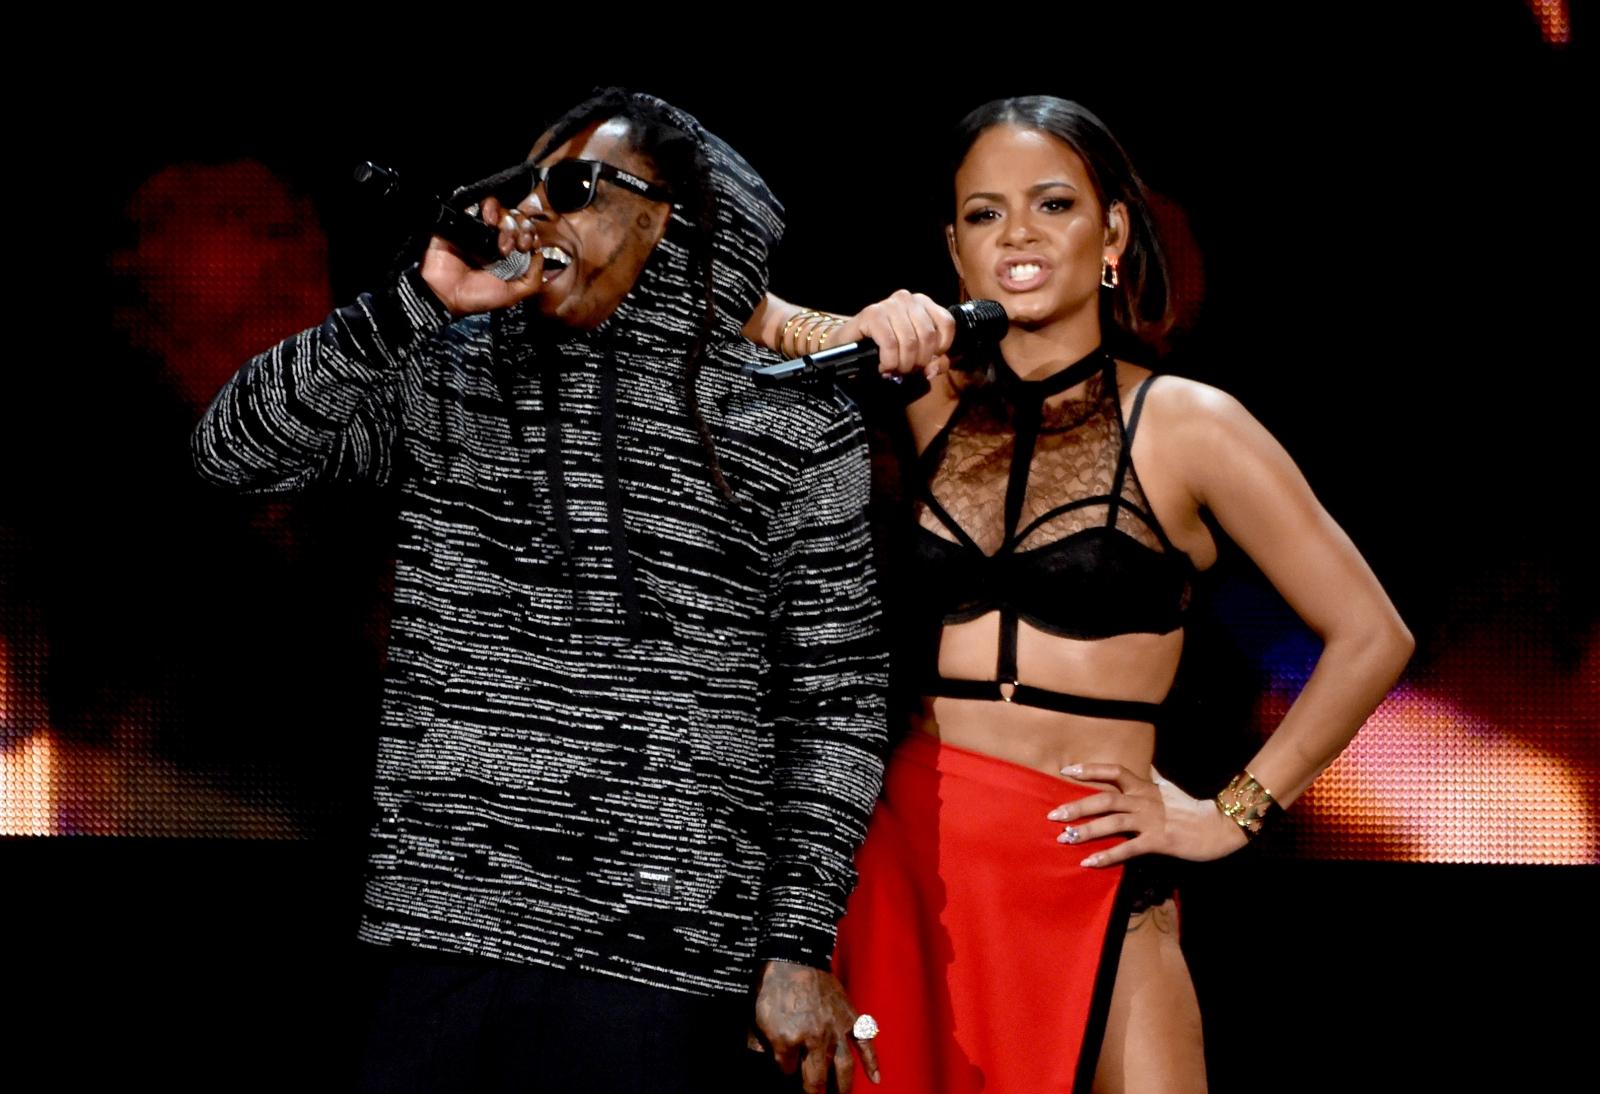 Christina Milian and Lil Wayne